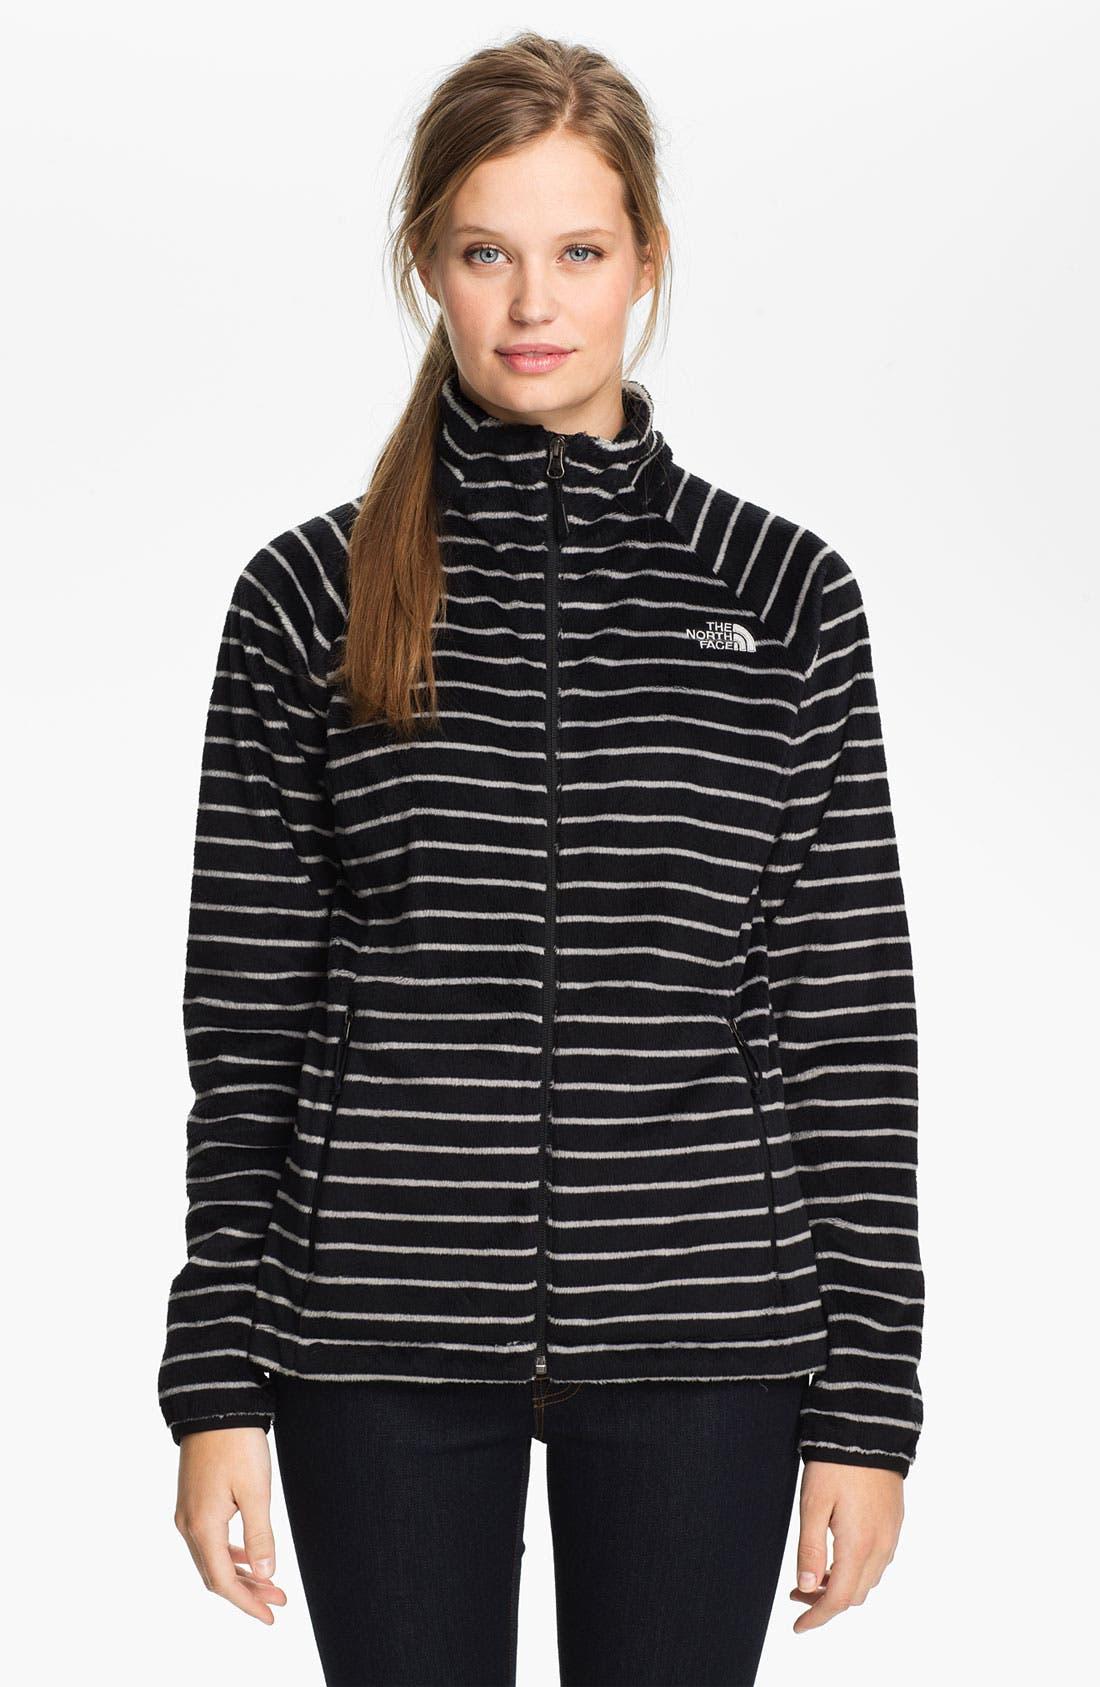 Main Image - The North Face 'Osito' Stripe Fleece Jacket